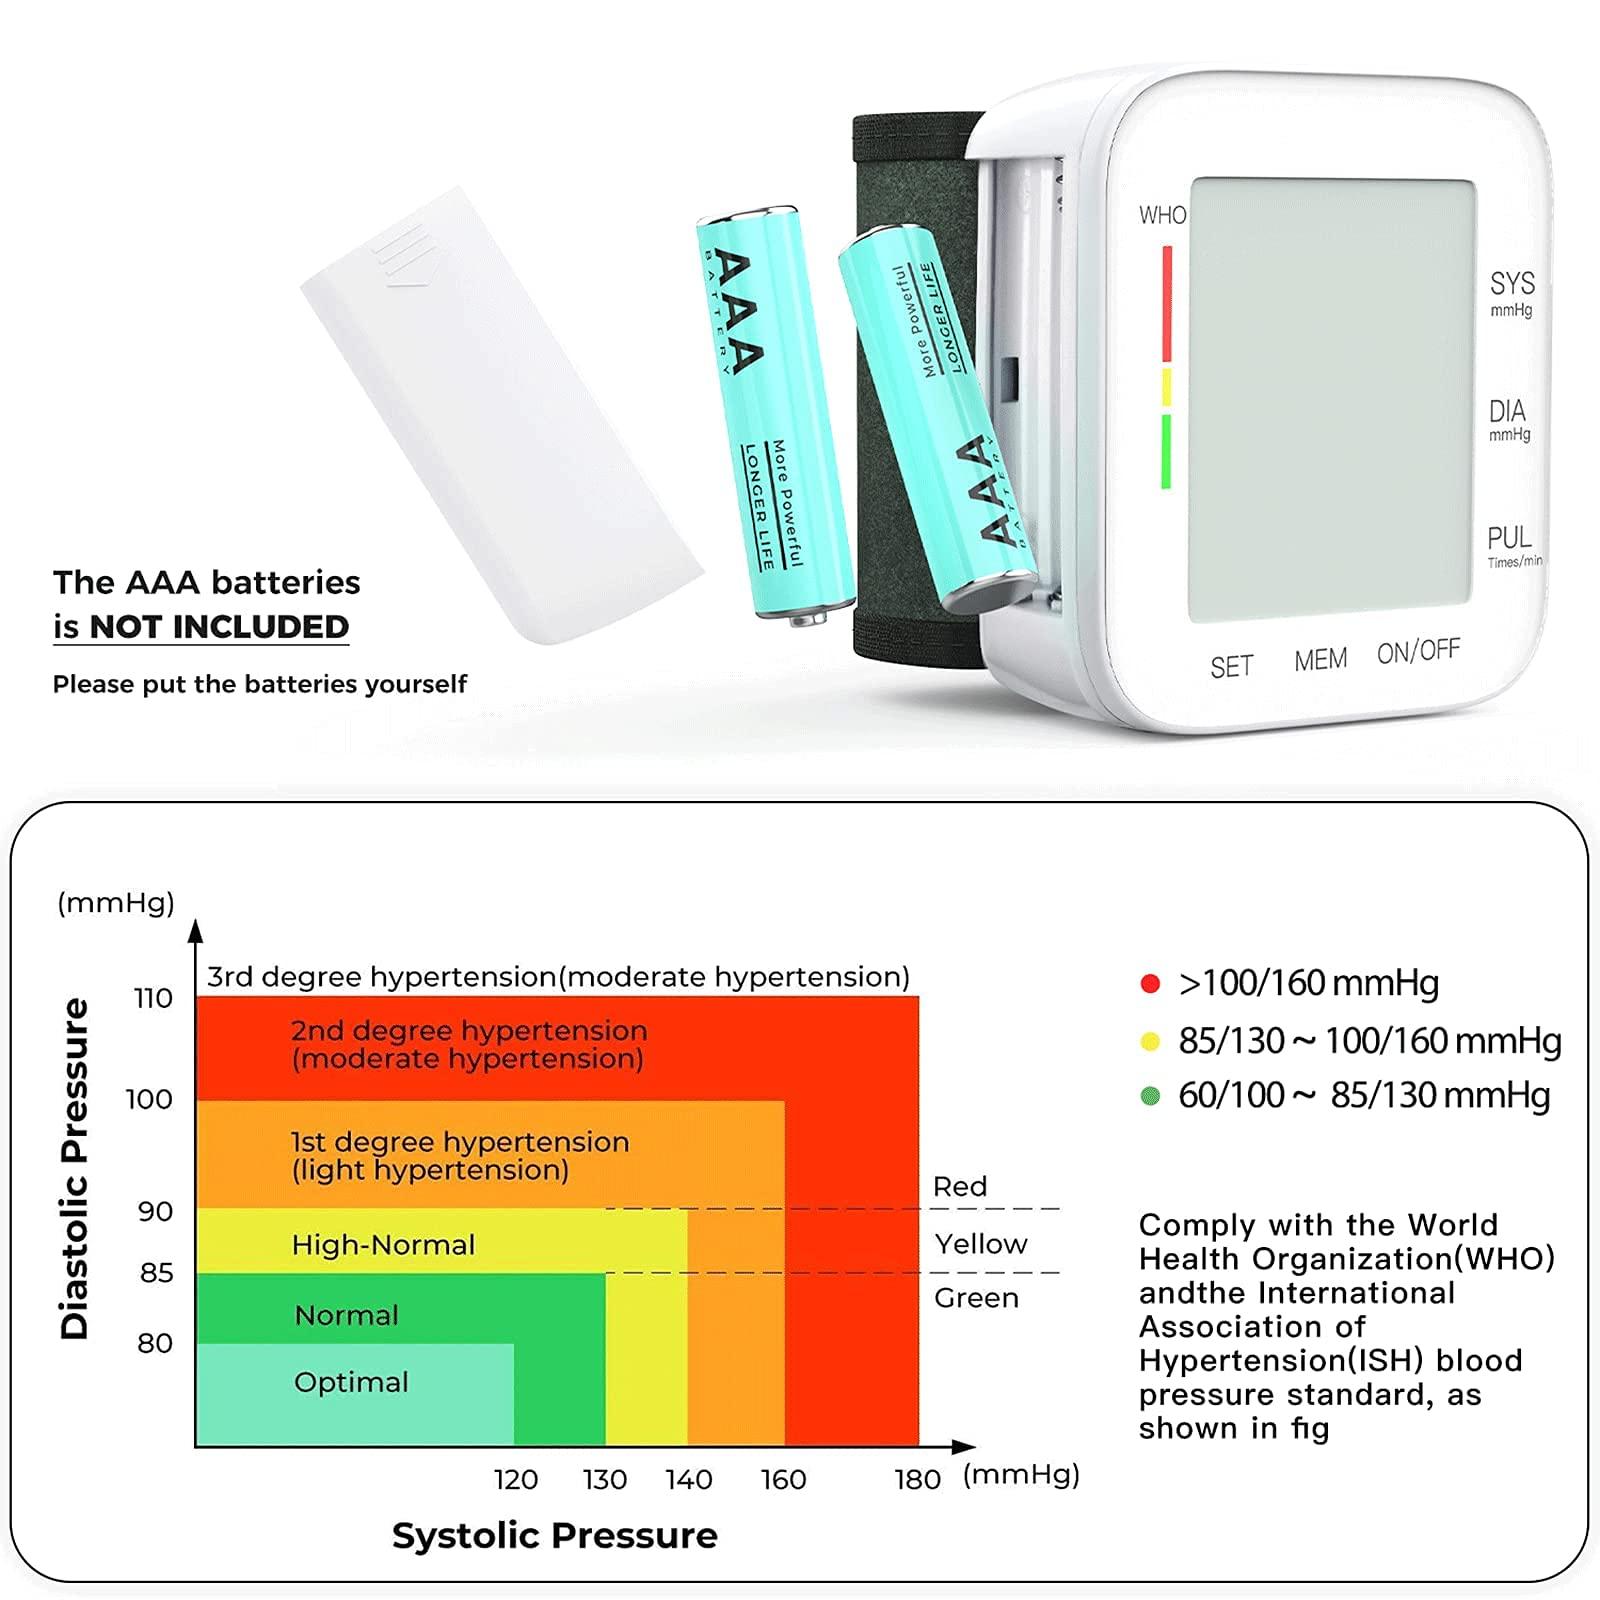 Blood Pressure Monitor LCD Display Adjustable Wrist Cuff Blood Pressure Monitors Ober Health 3